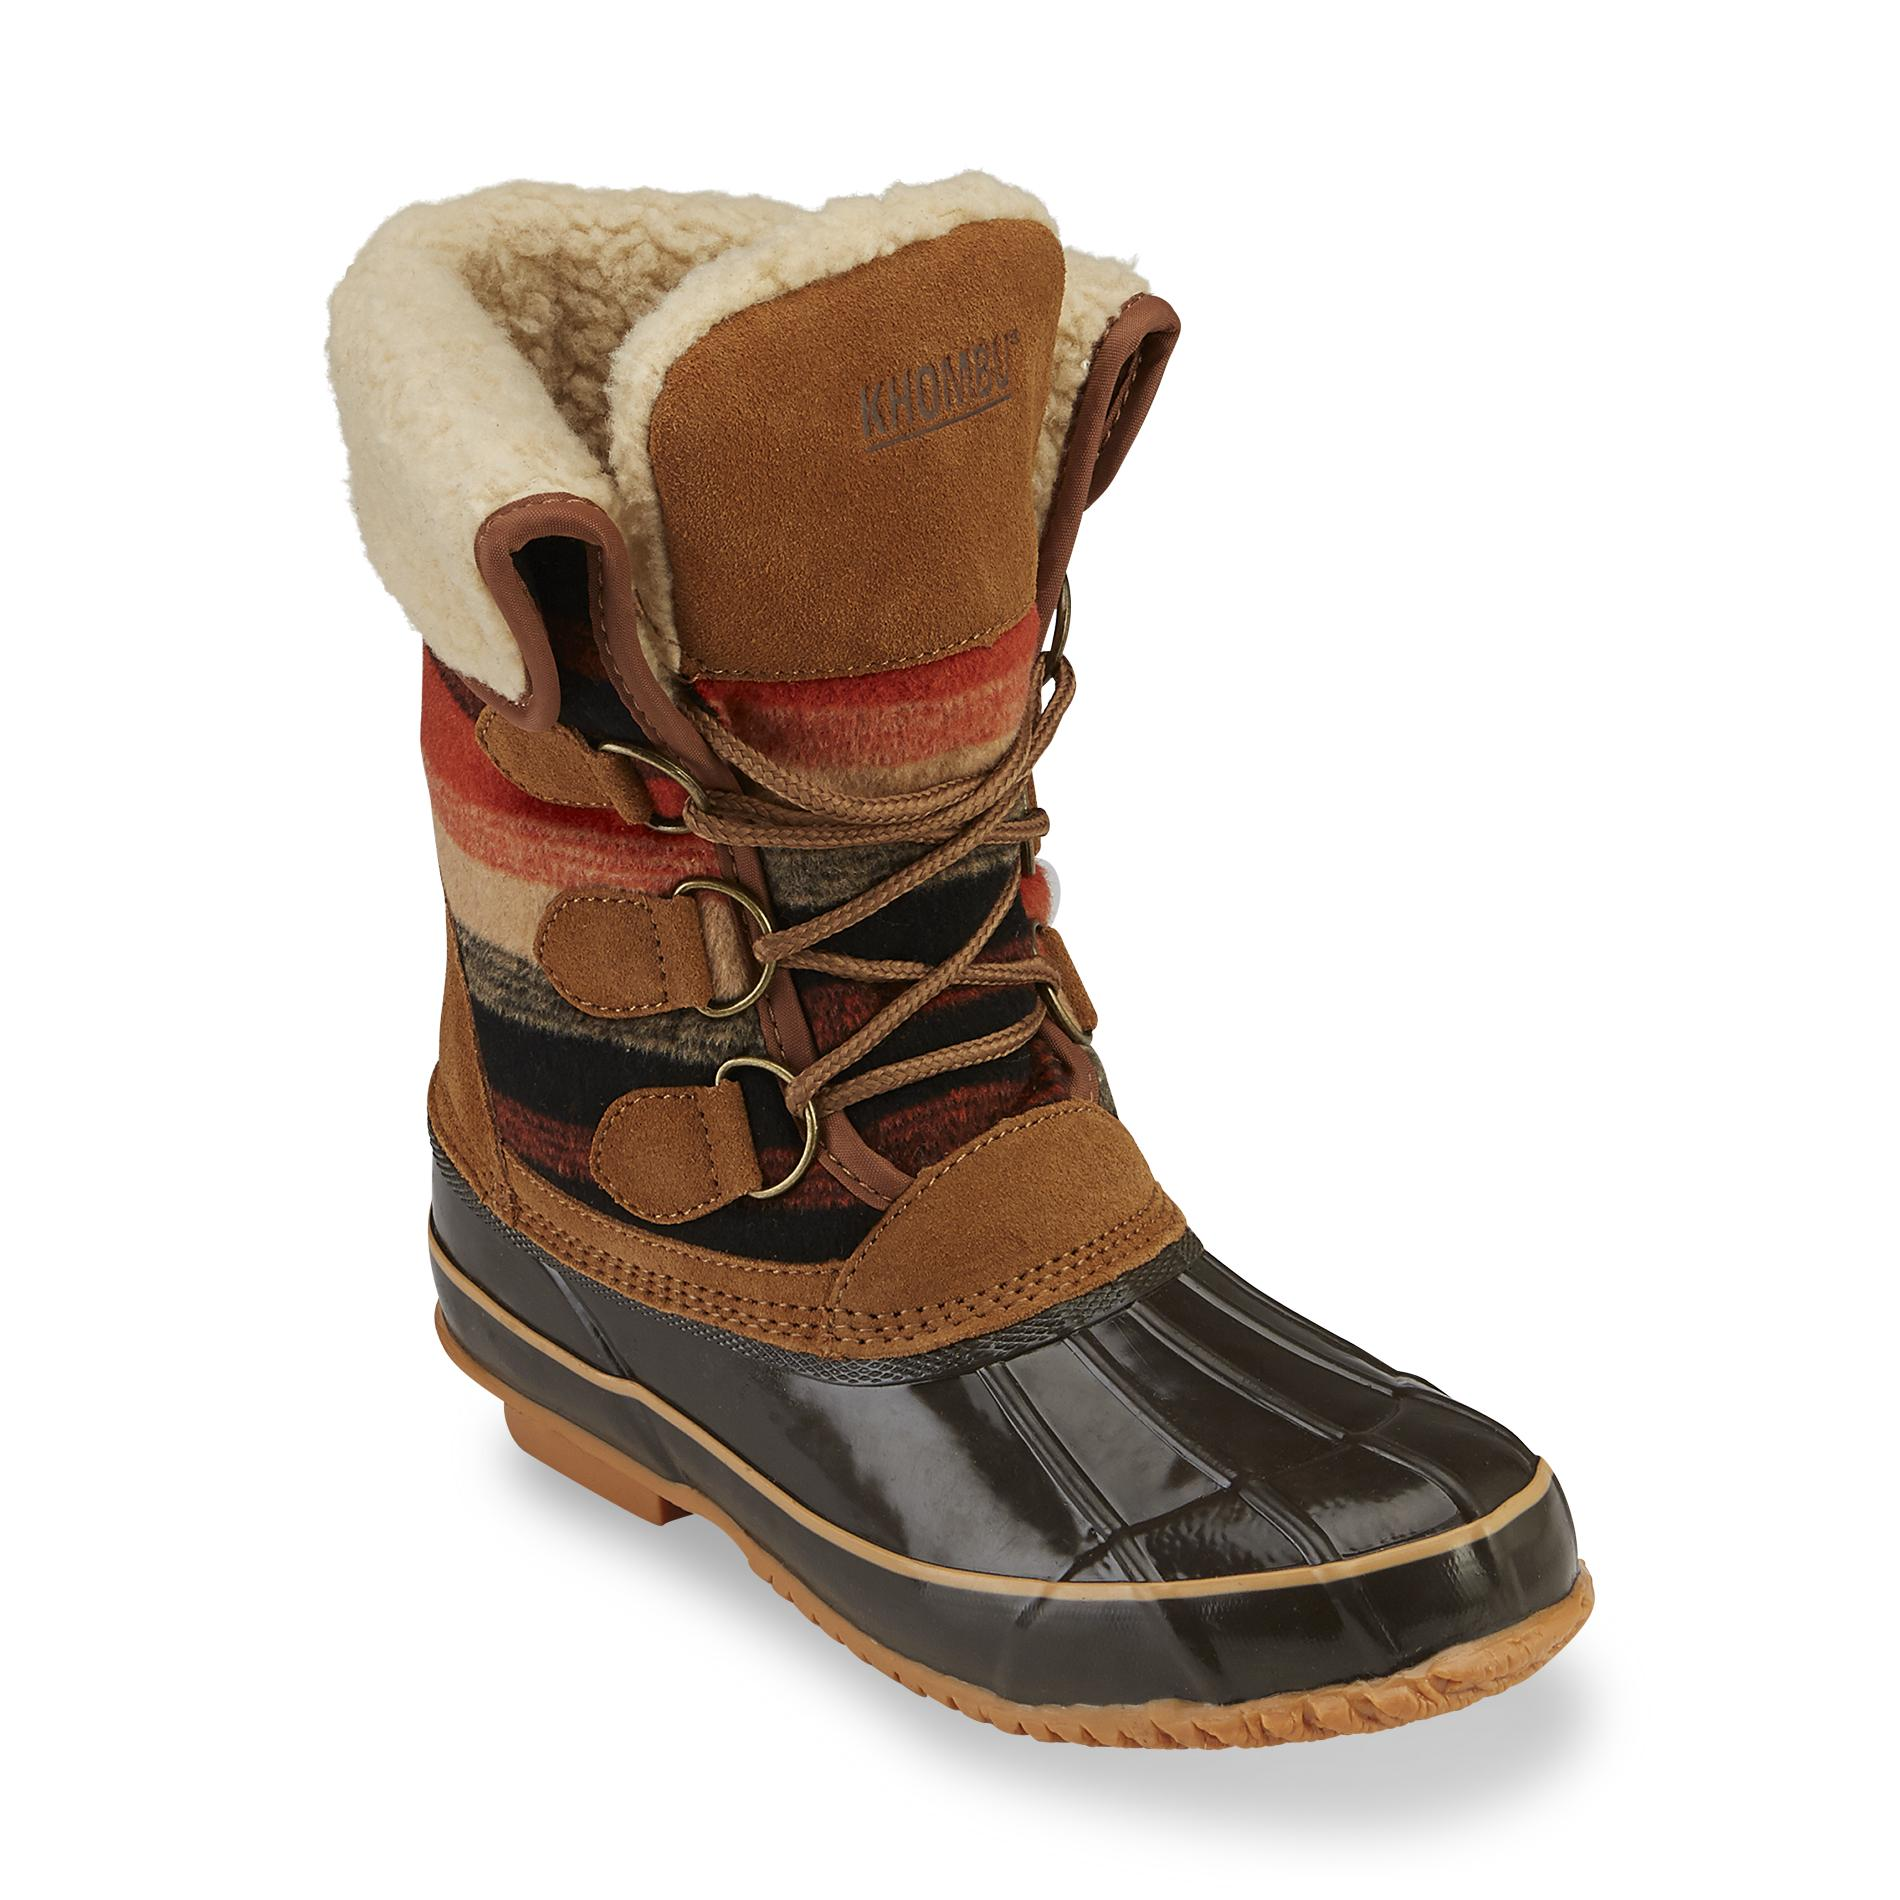 khombu boots khombu womenu0027s jilly brown/multicolor waterproof winter boot PDCHJIX